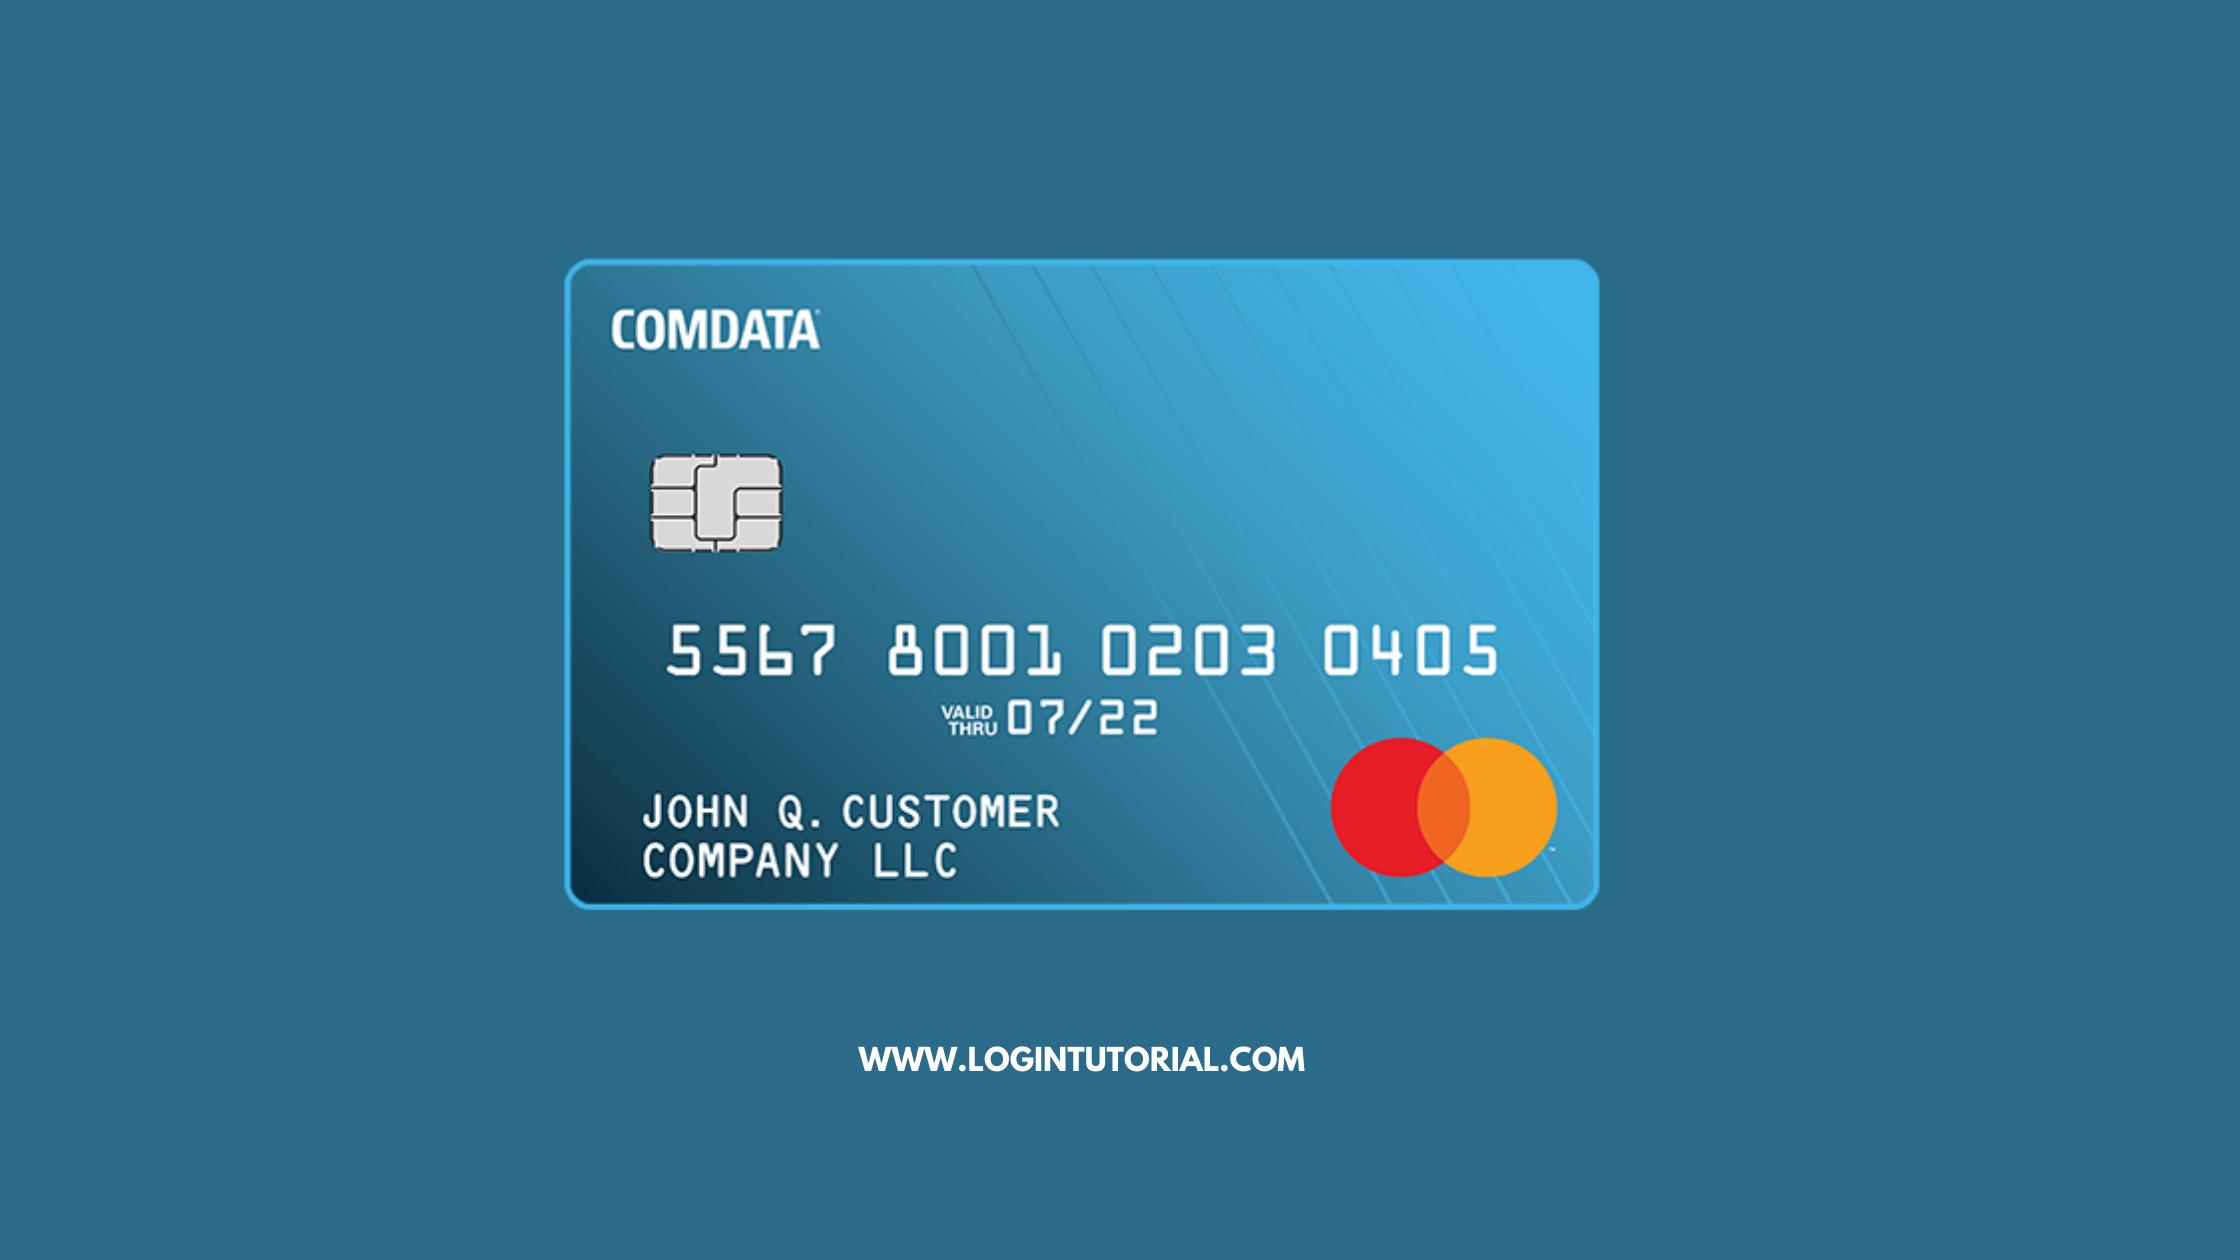 comdata card login Guide